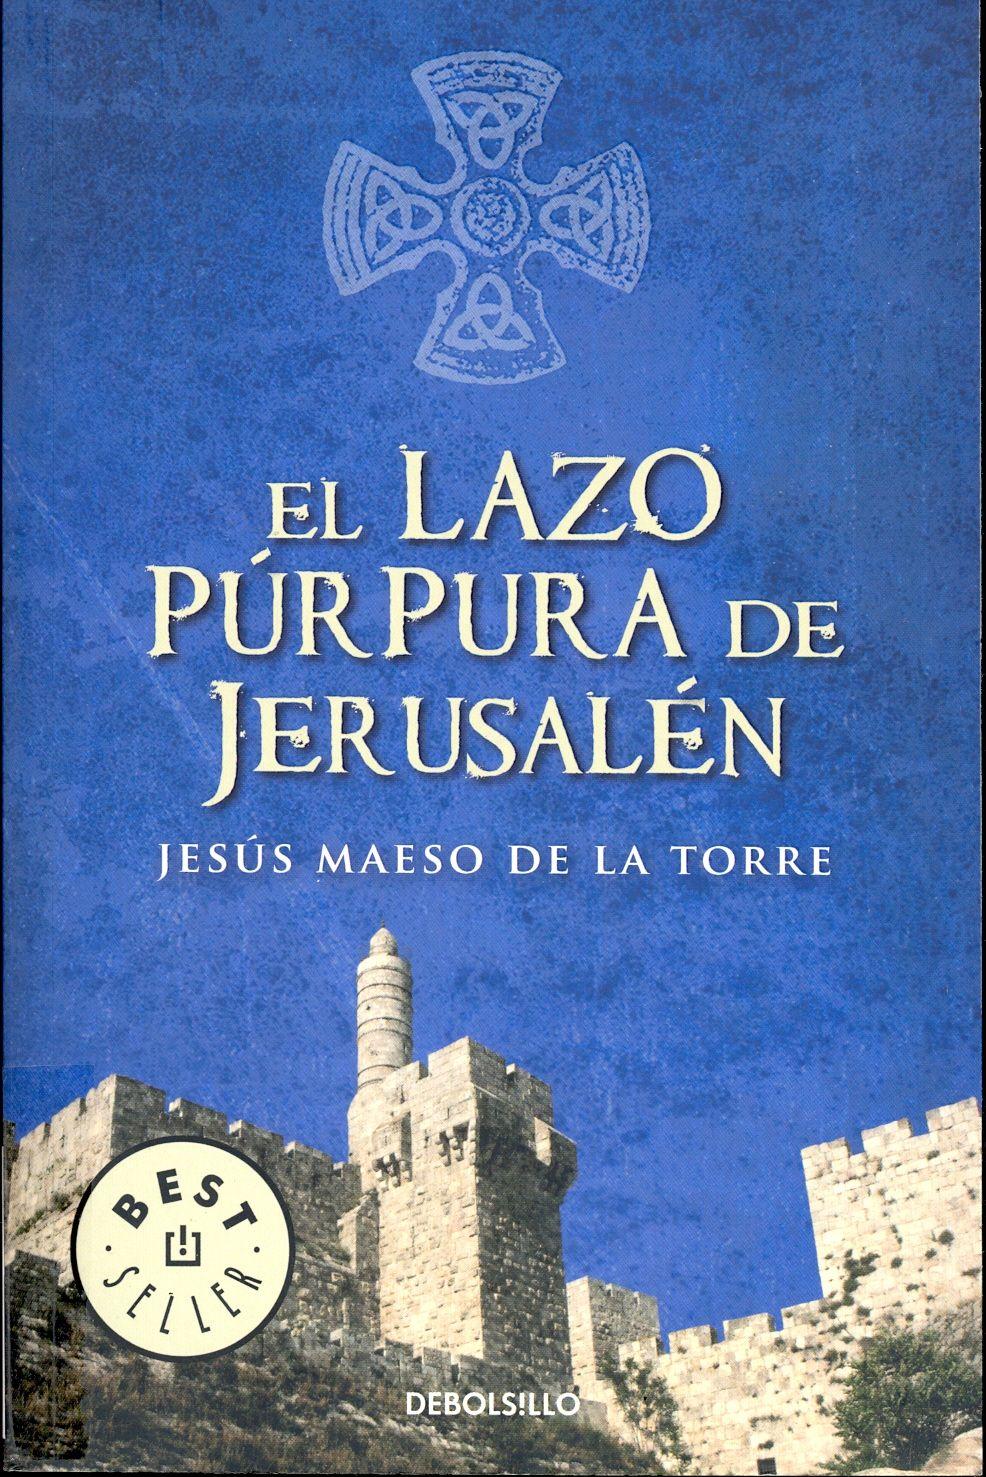 Http Catalogo Bibliotecas Cervantes Es General Abnetcl Exe Subc Sofi Acc Dosearch Xsqf99 596853 Books Book Cover Reading